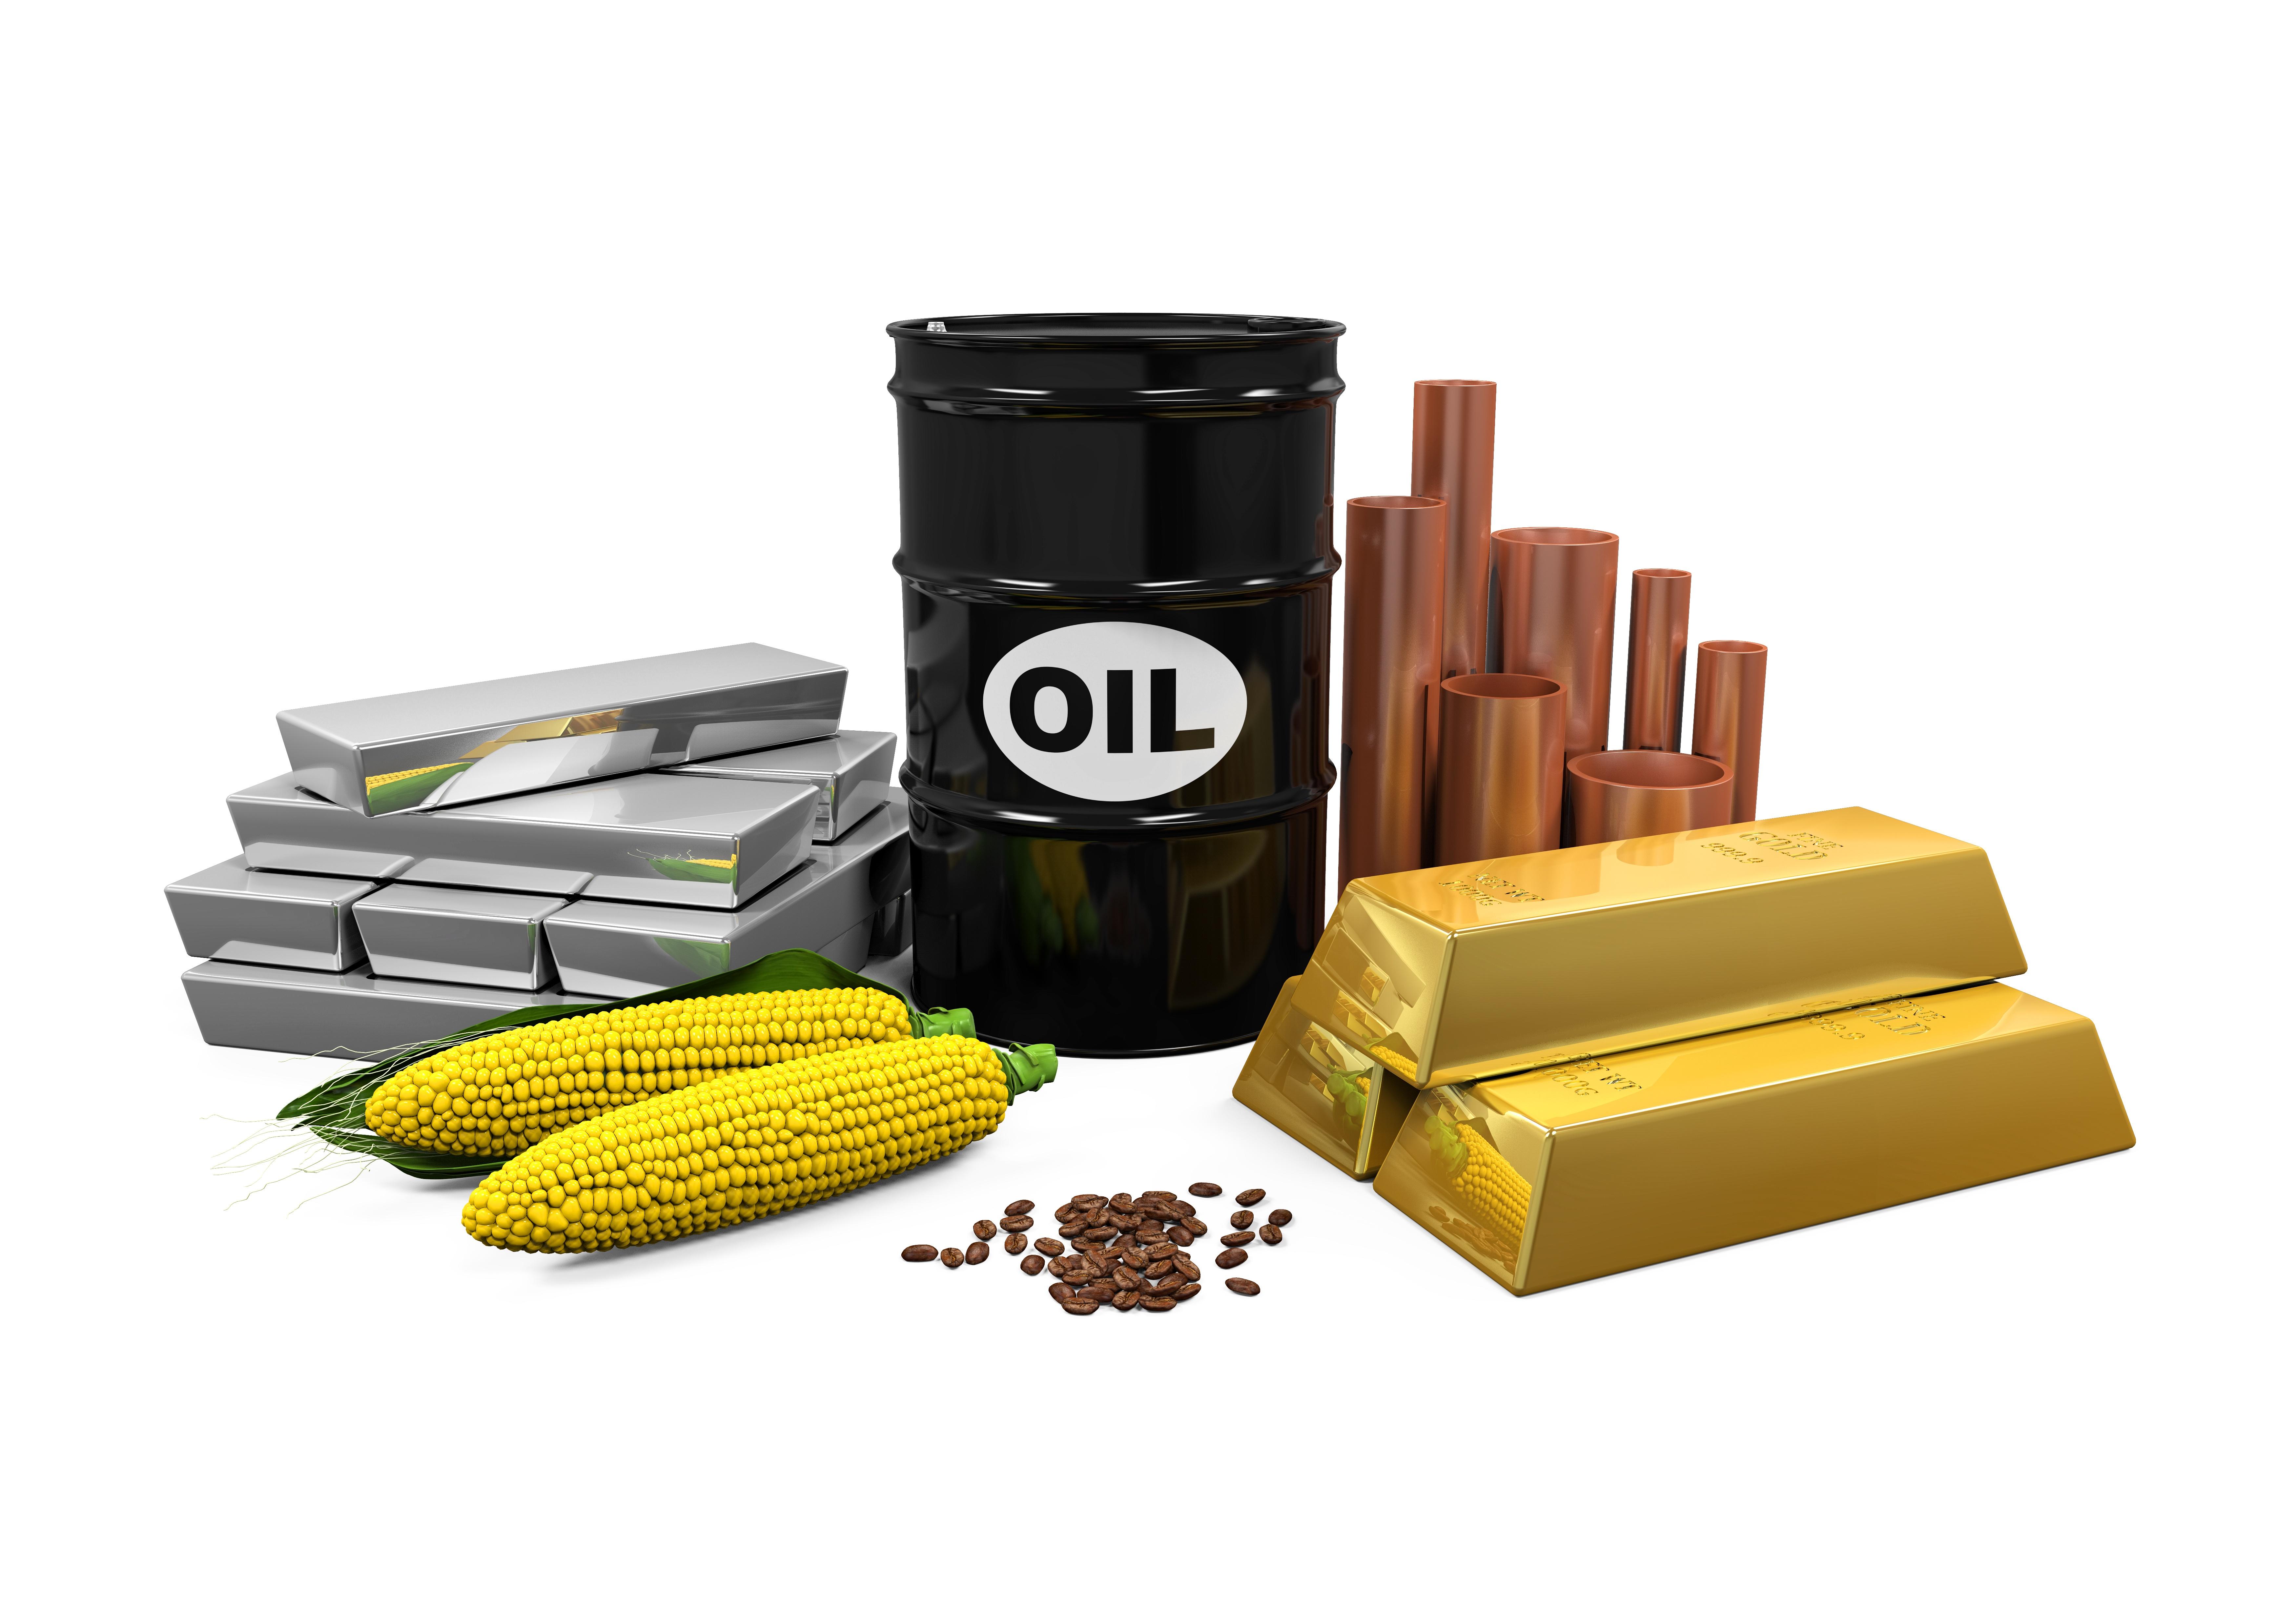 bigstock-Commodities--Oil-Gold-Silve-100584635.jpg